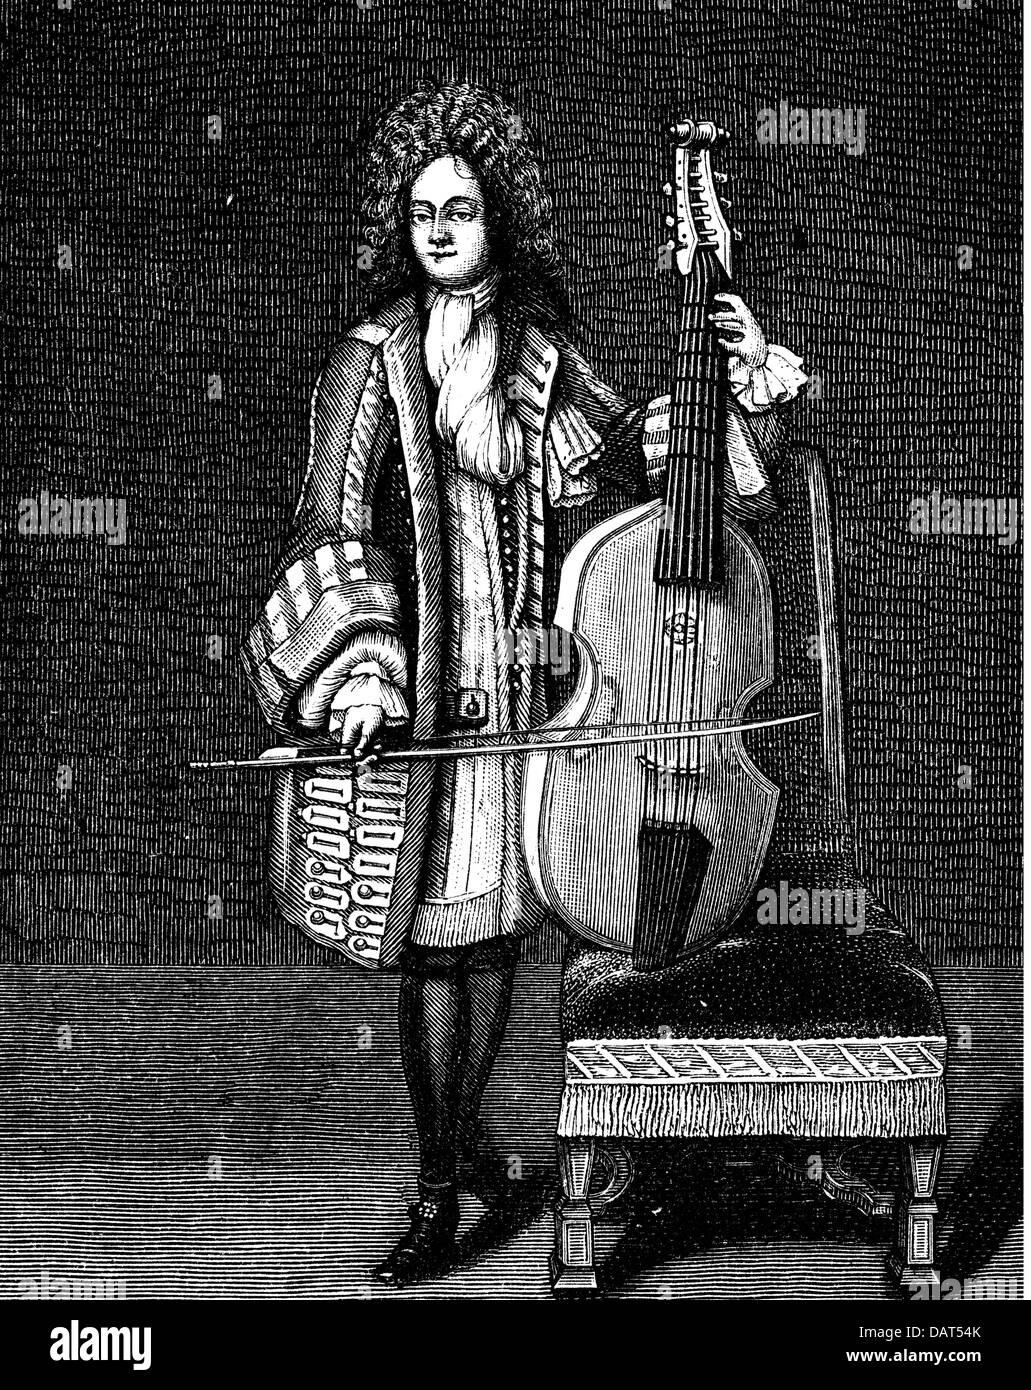 Schenk, Johann, 30.11.1753 - 29.12.1836, Austrian musician (composer), full length in livery, wood engraving based - Stock Image